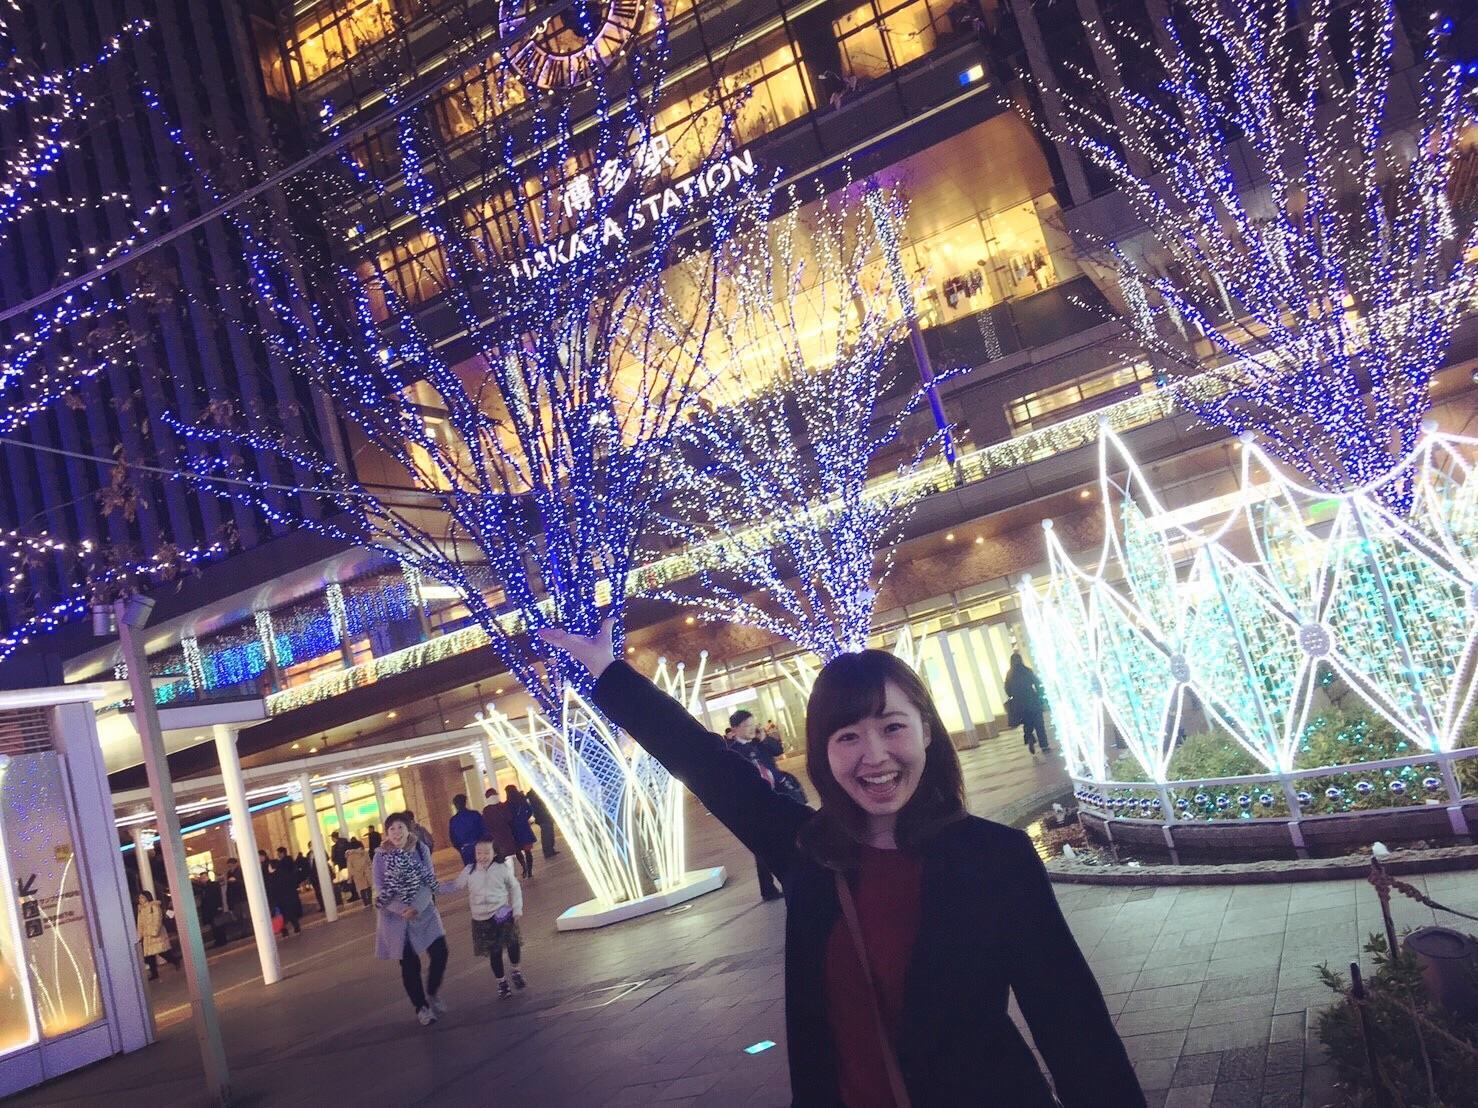 f:id:saitomayu:20161219231145j:image